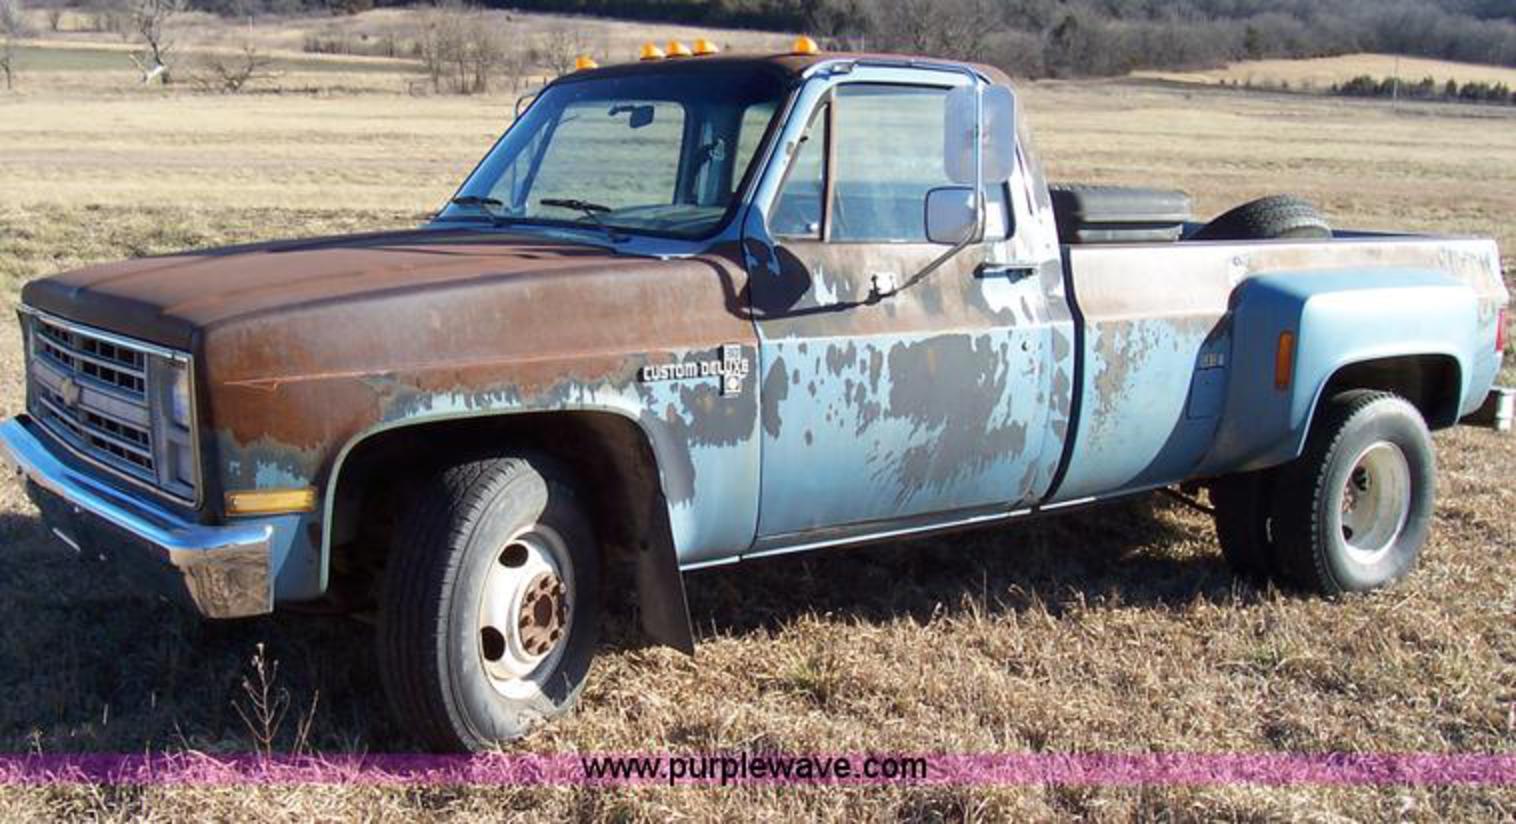 Jpg Chevrolet C Custom Deluxe Pickup Truck Miles On B on Chevy Truck Seat Covers